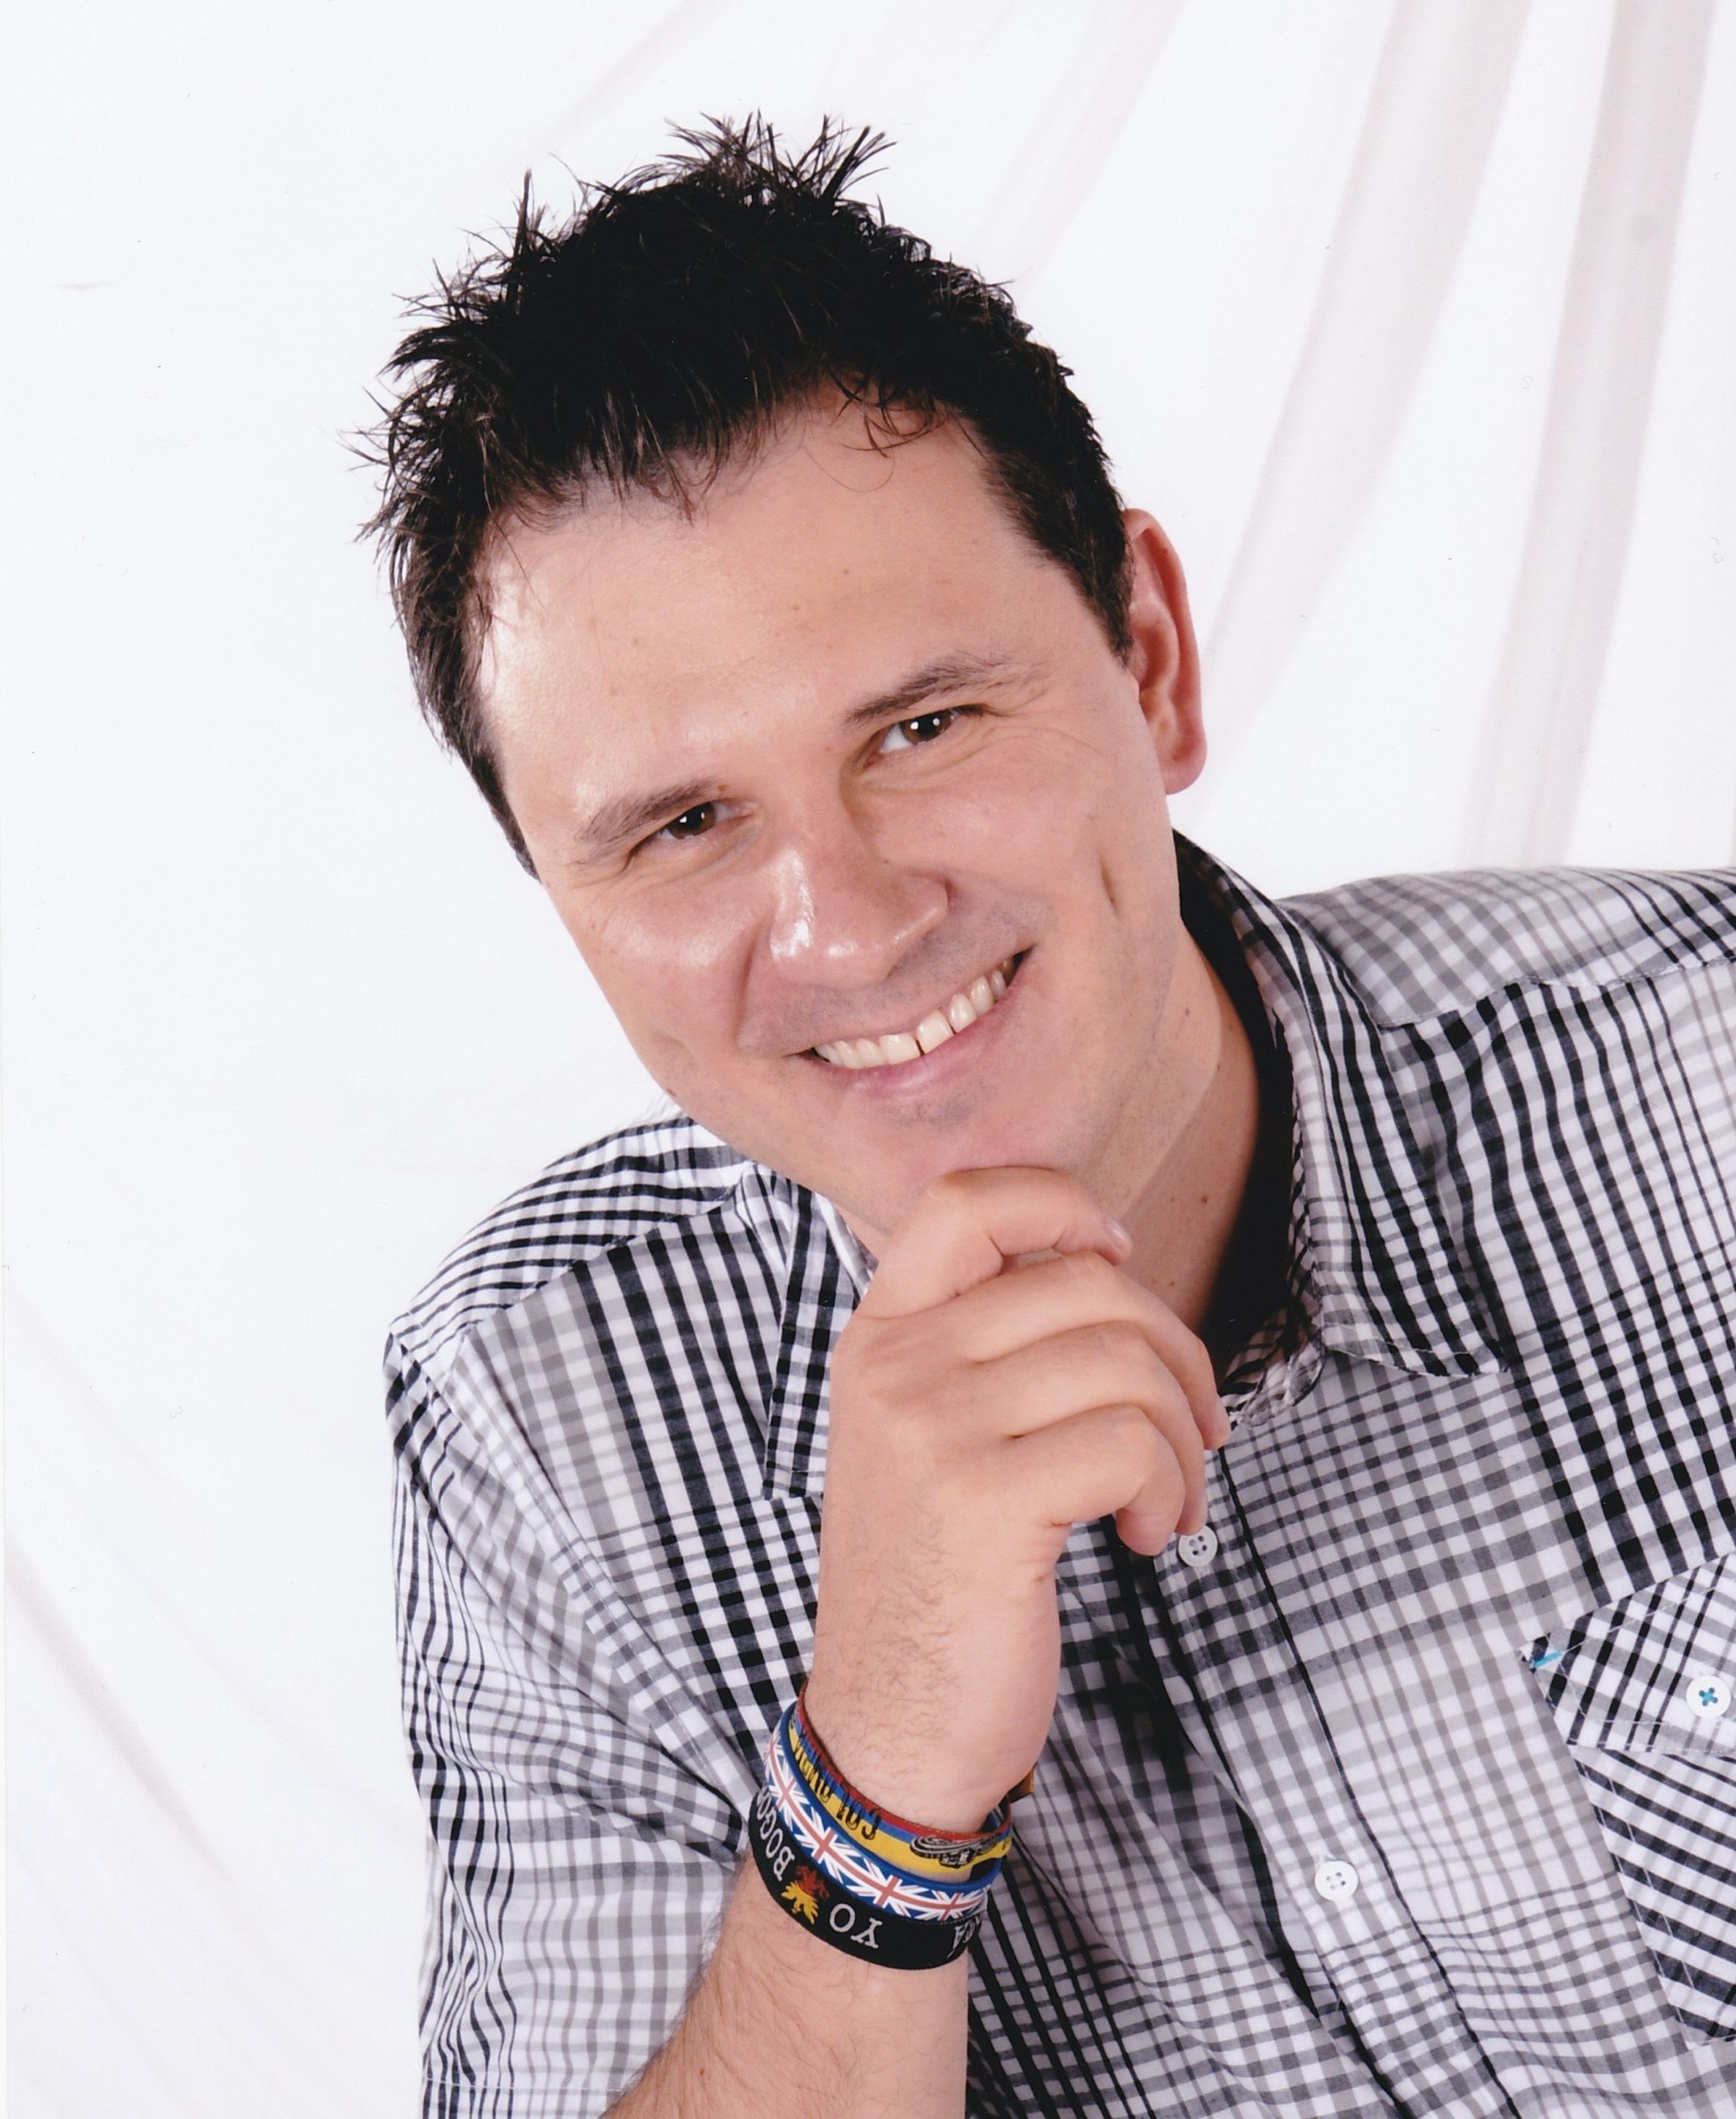 Paul Urwin Director TraducccionesBogota.com